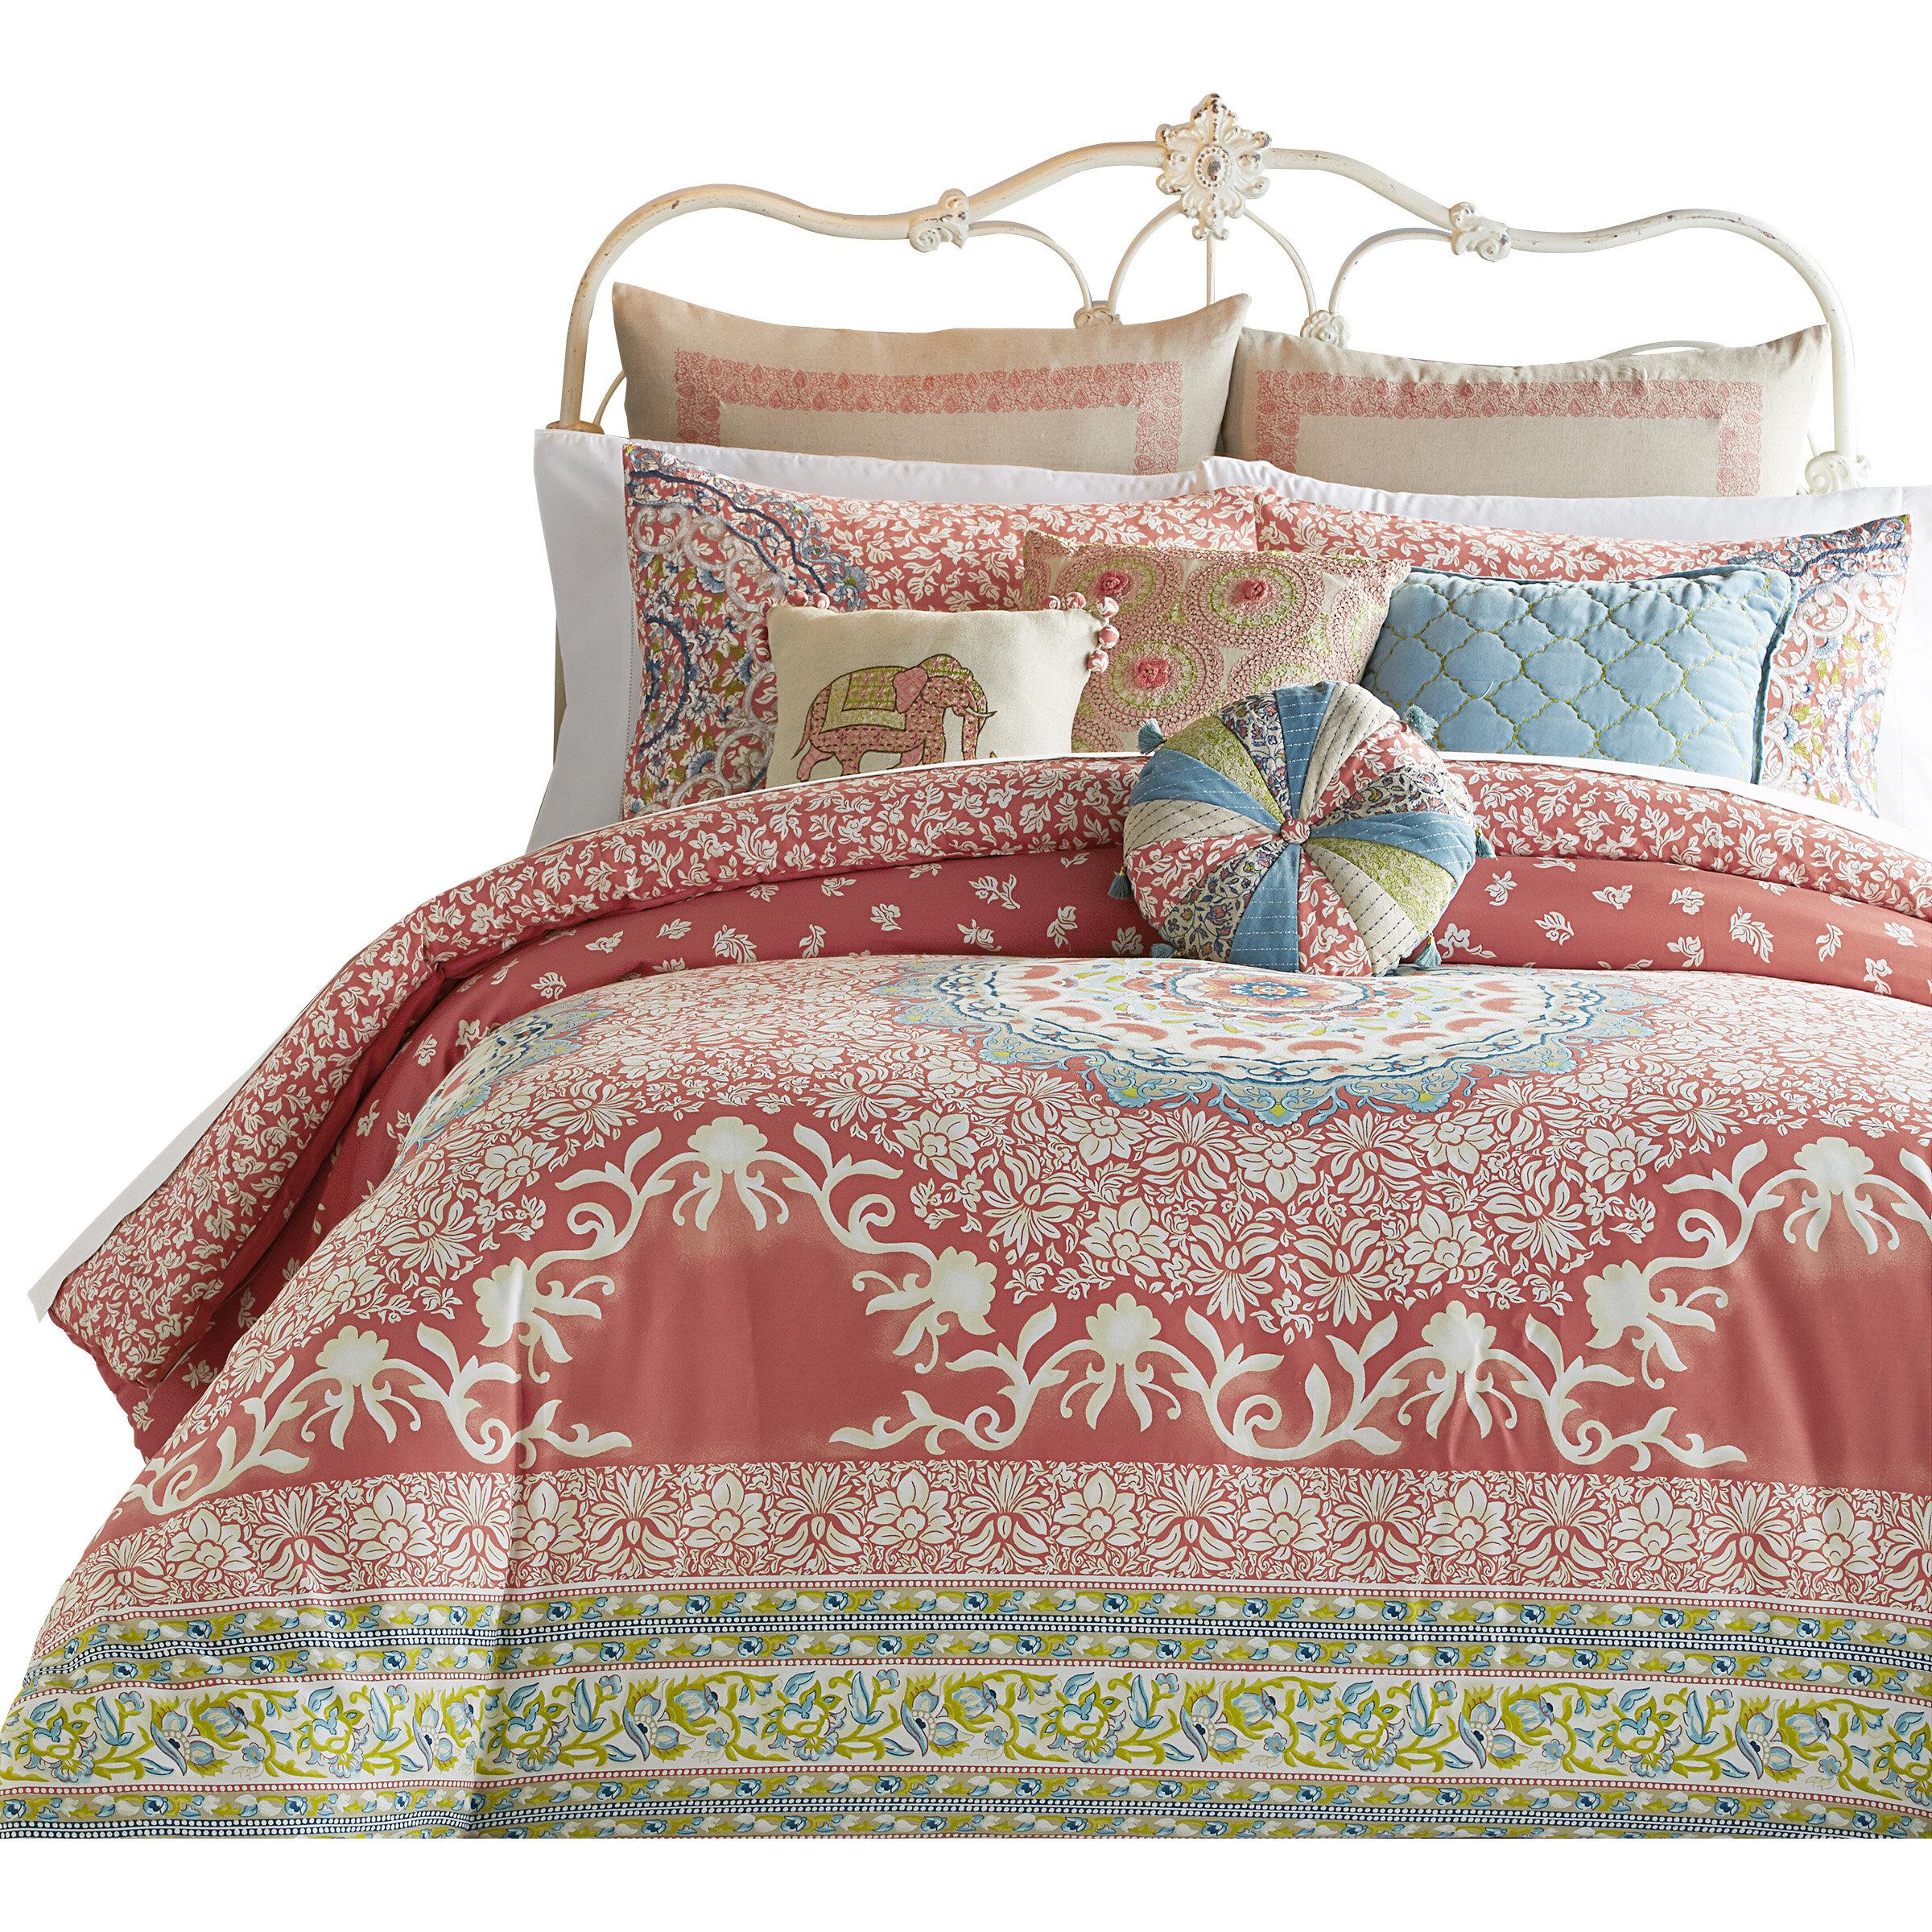 image itm maya ebay queen set is loading bedding pink turquoise sets comforter piece